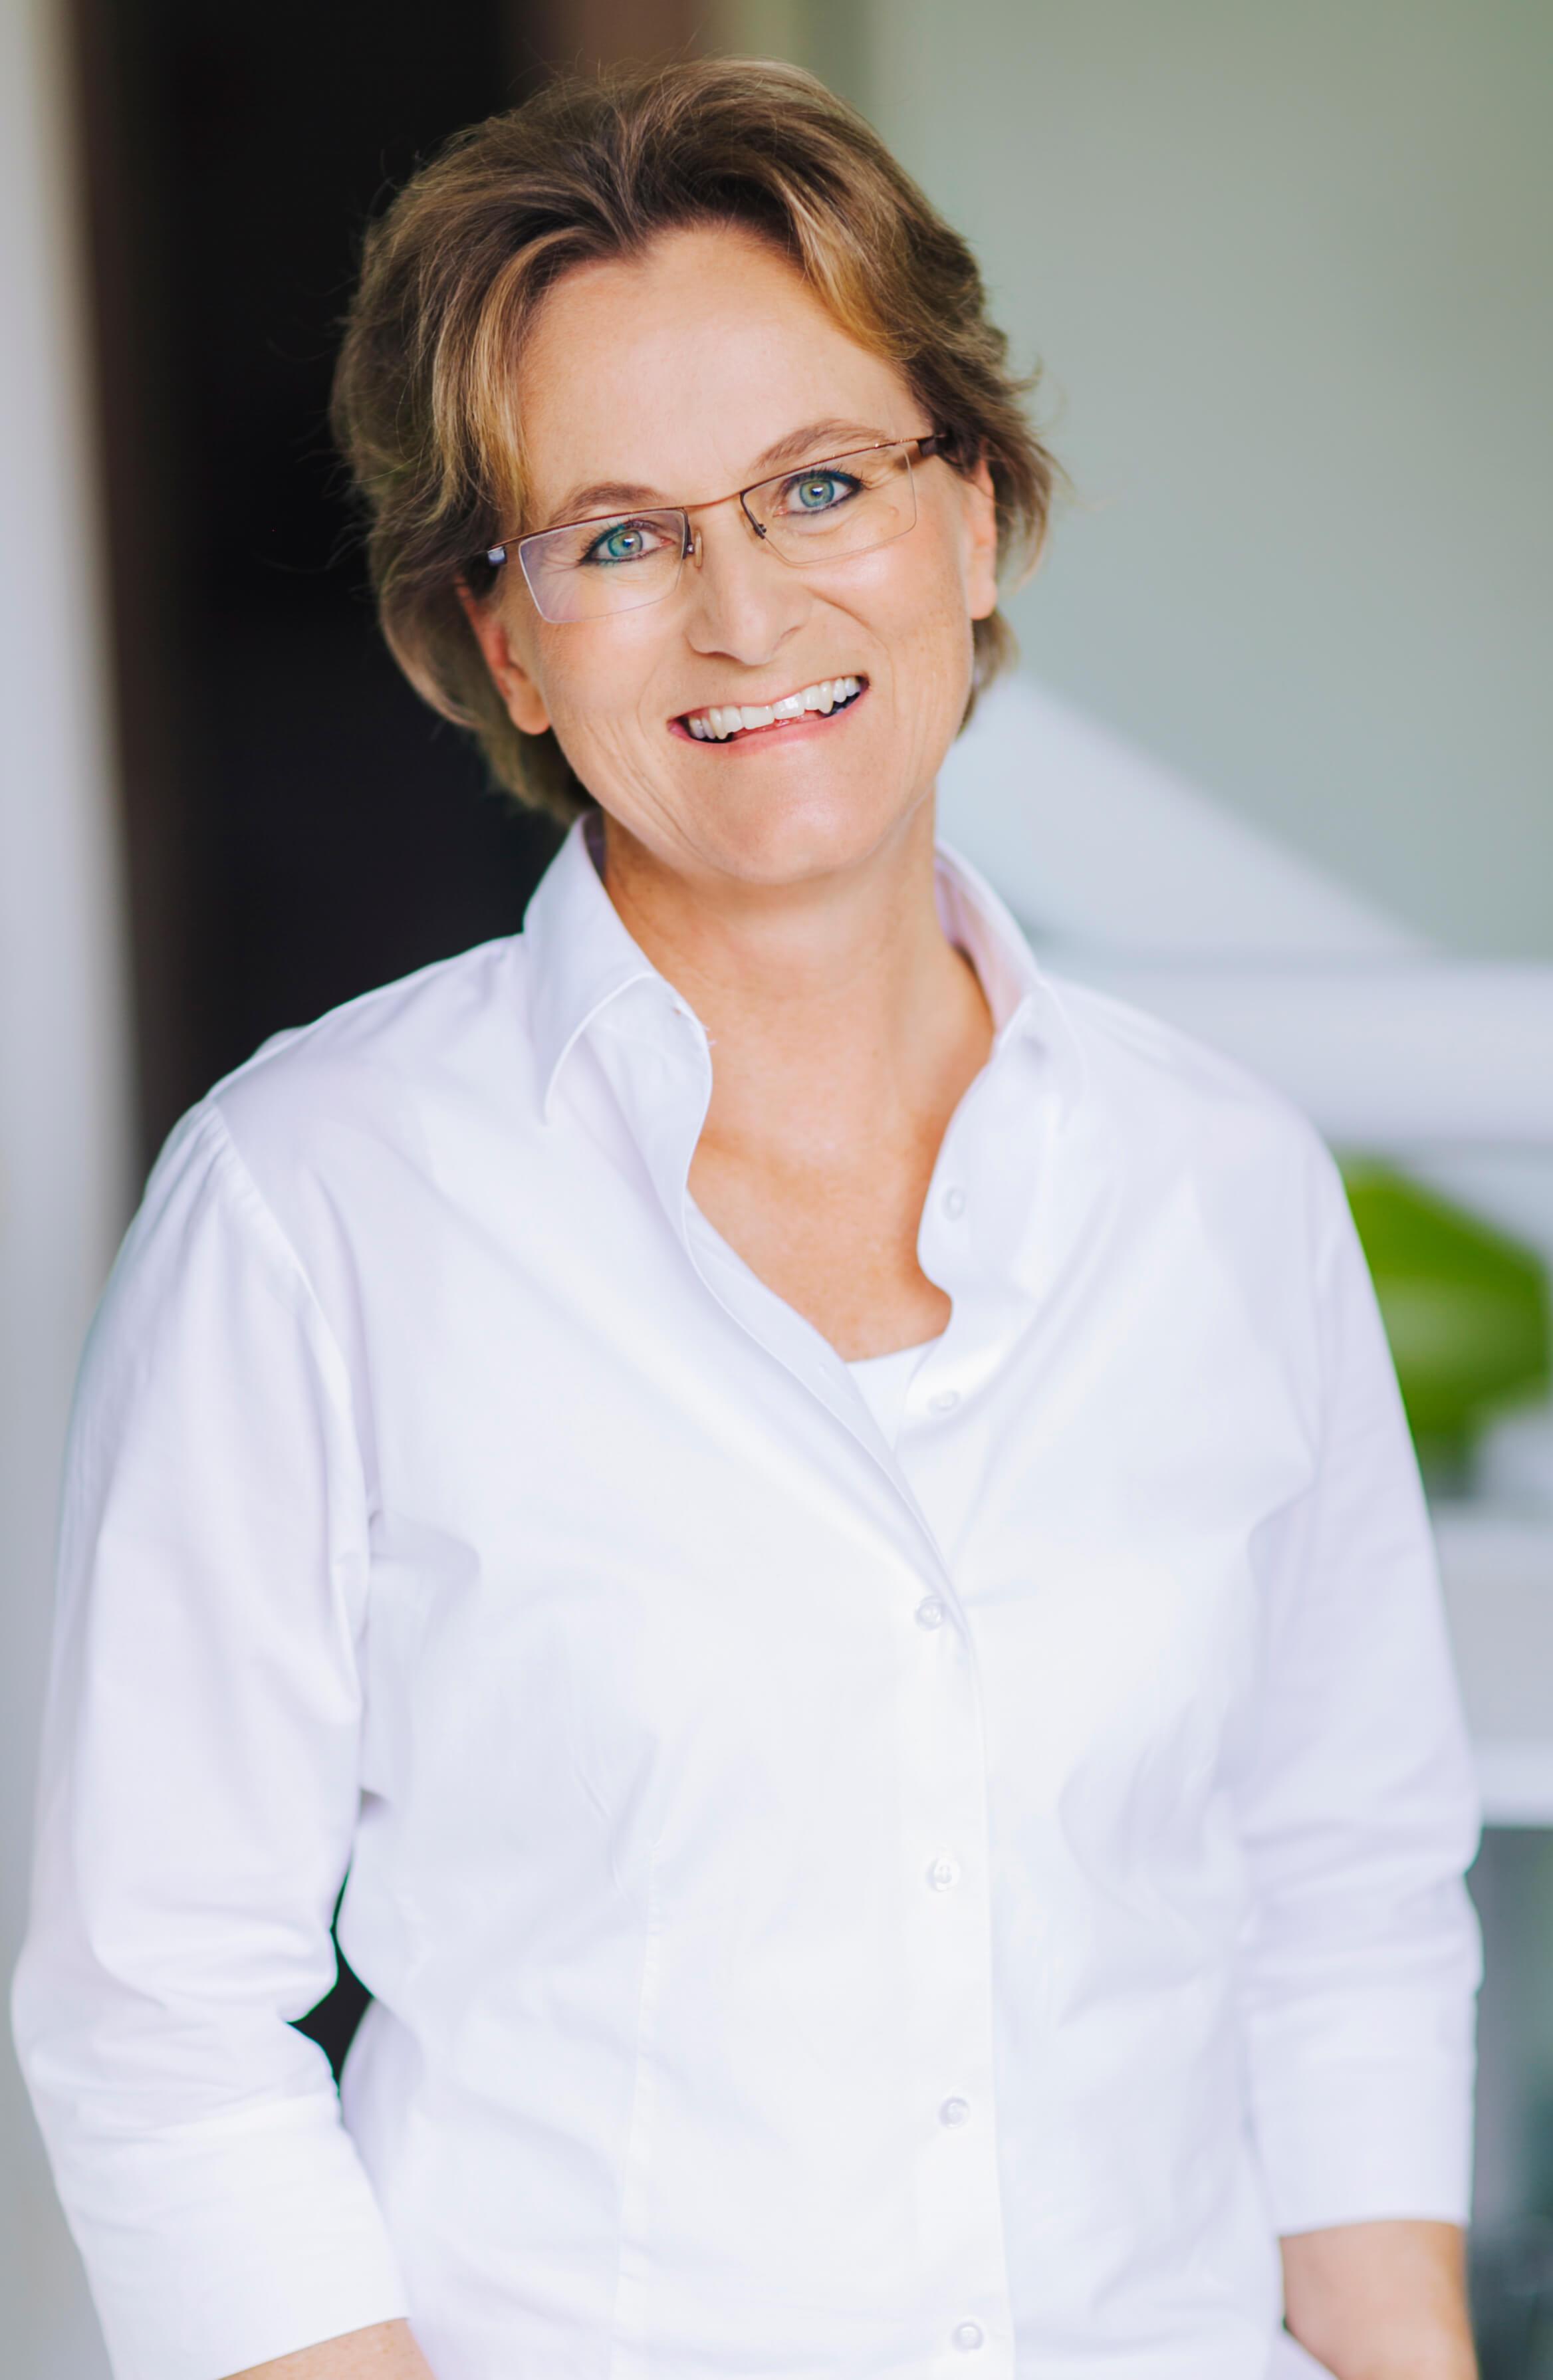 Dr. Nicola Koepchen